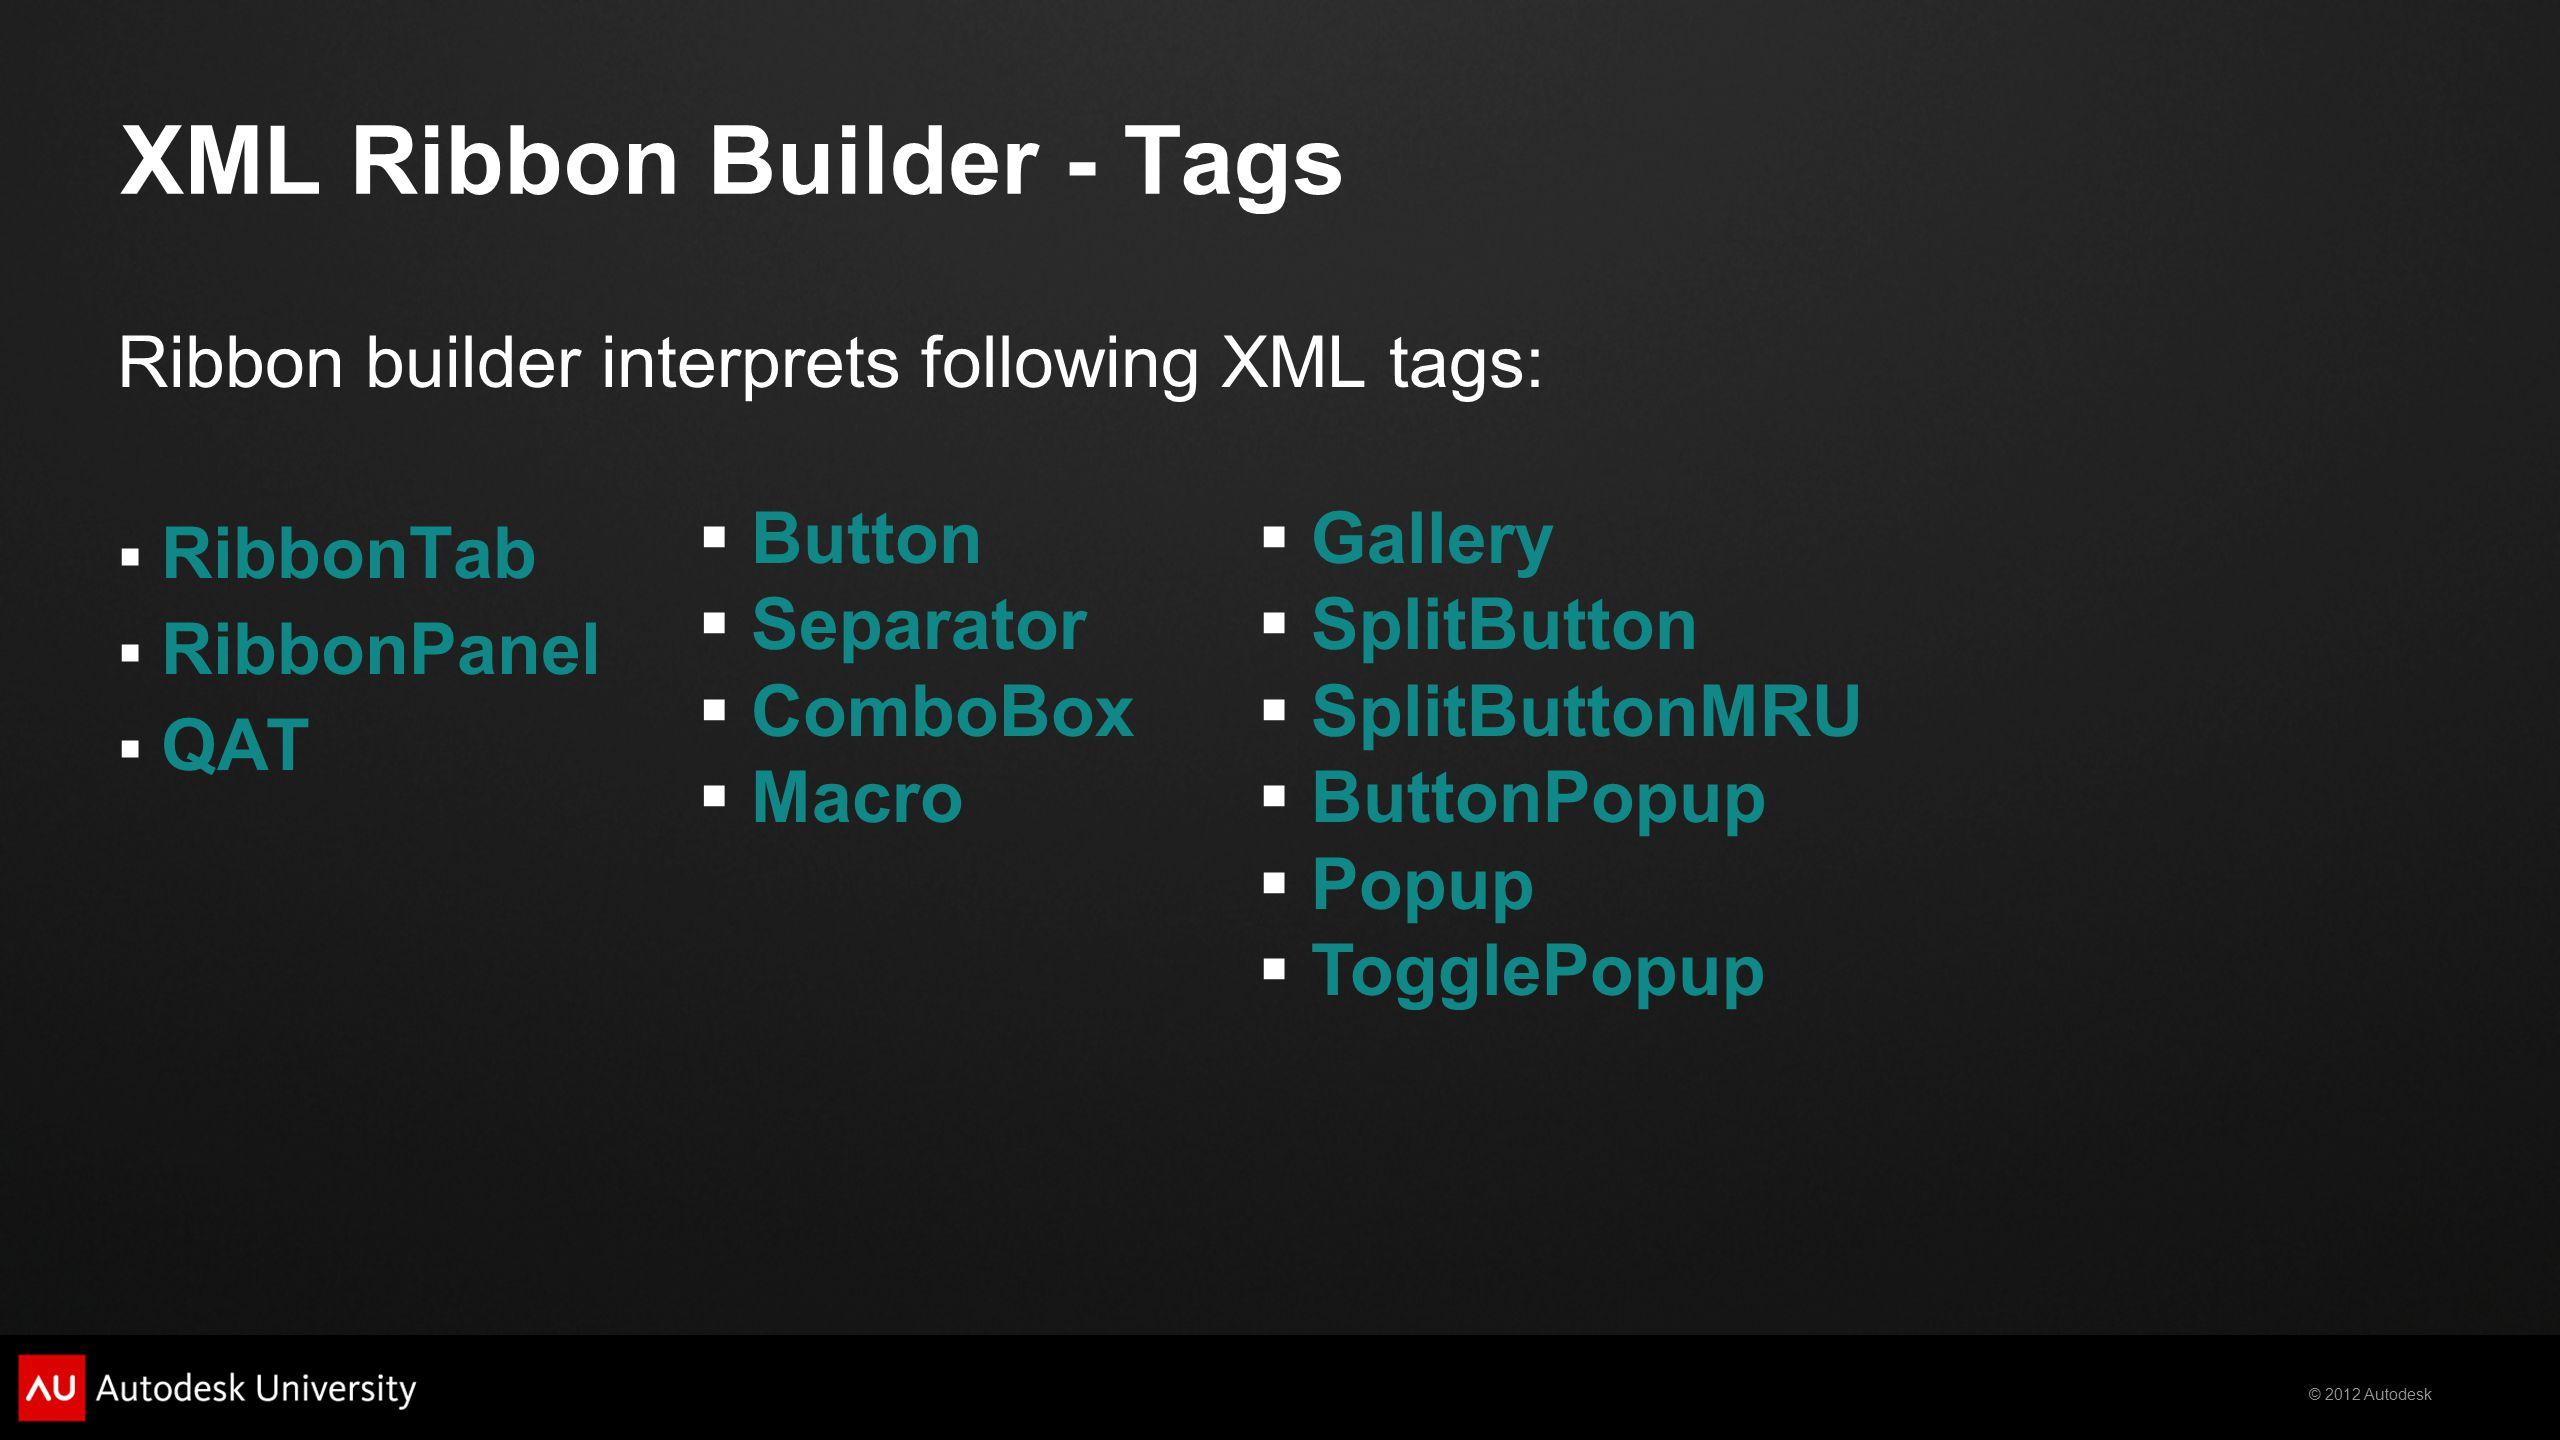 © 2012 Autodesk XML Ribbon Builder - Tags Ribbon builder interprets following XML tags:  RibbonTab  RibbonPanel  QAT  Gallery  SplitButton  Spli